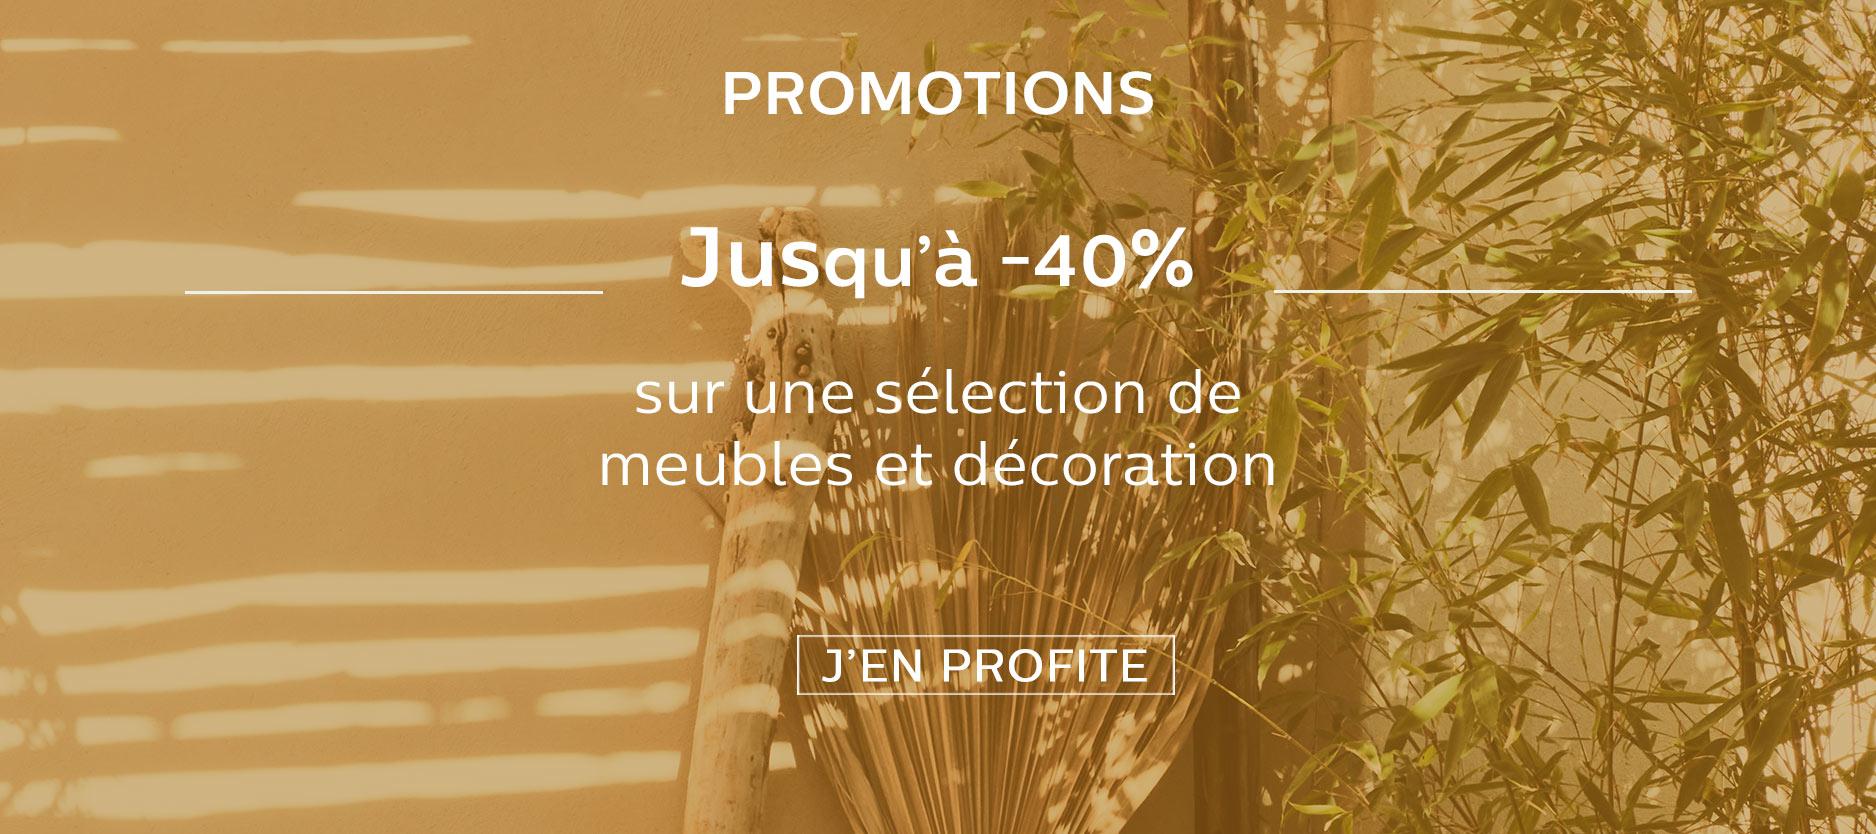 alinea-promotions